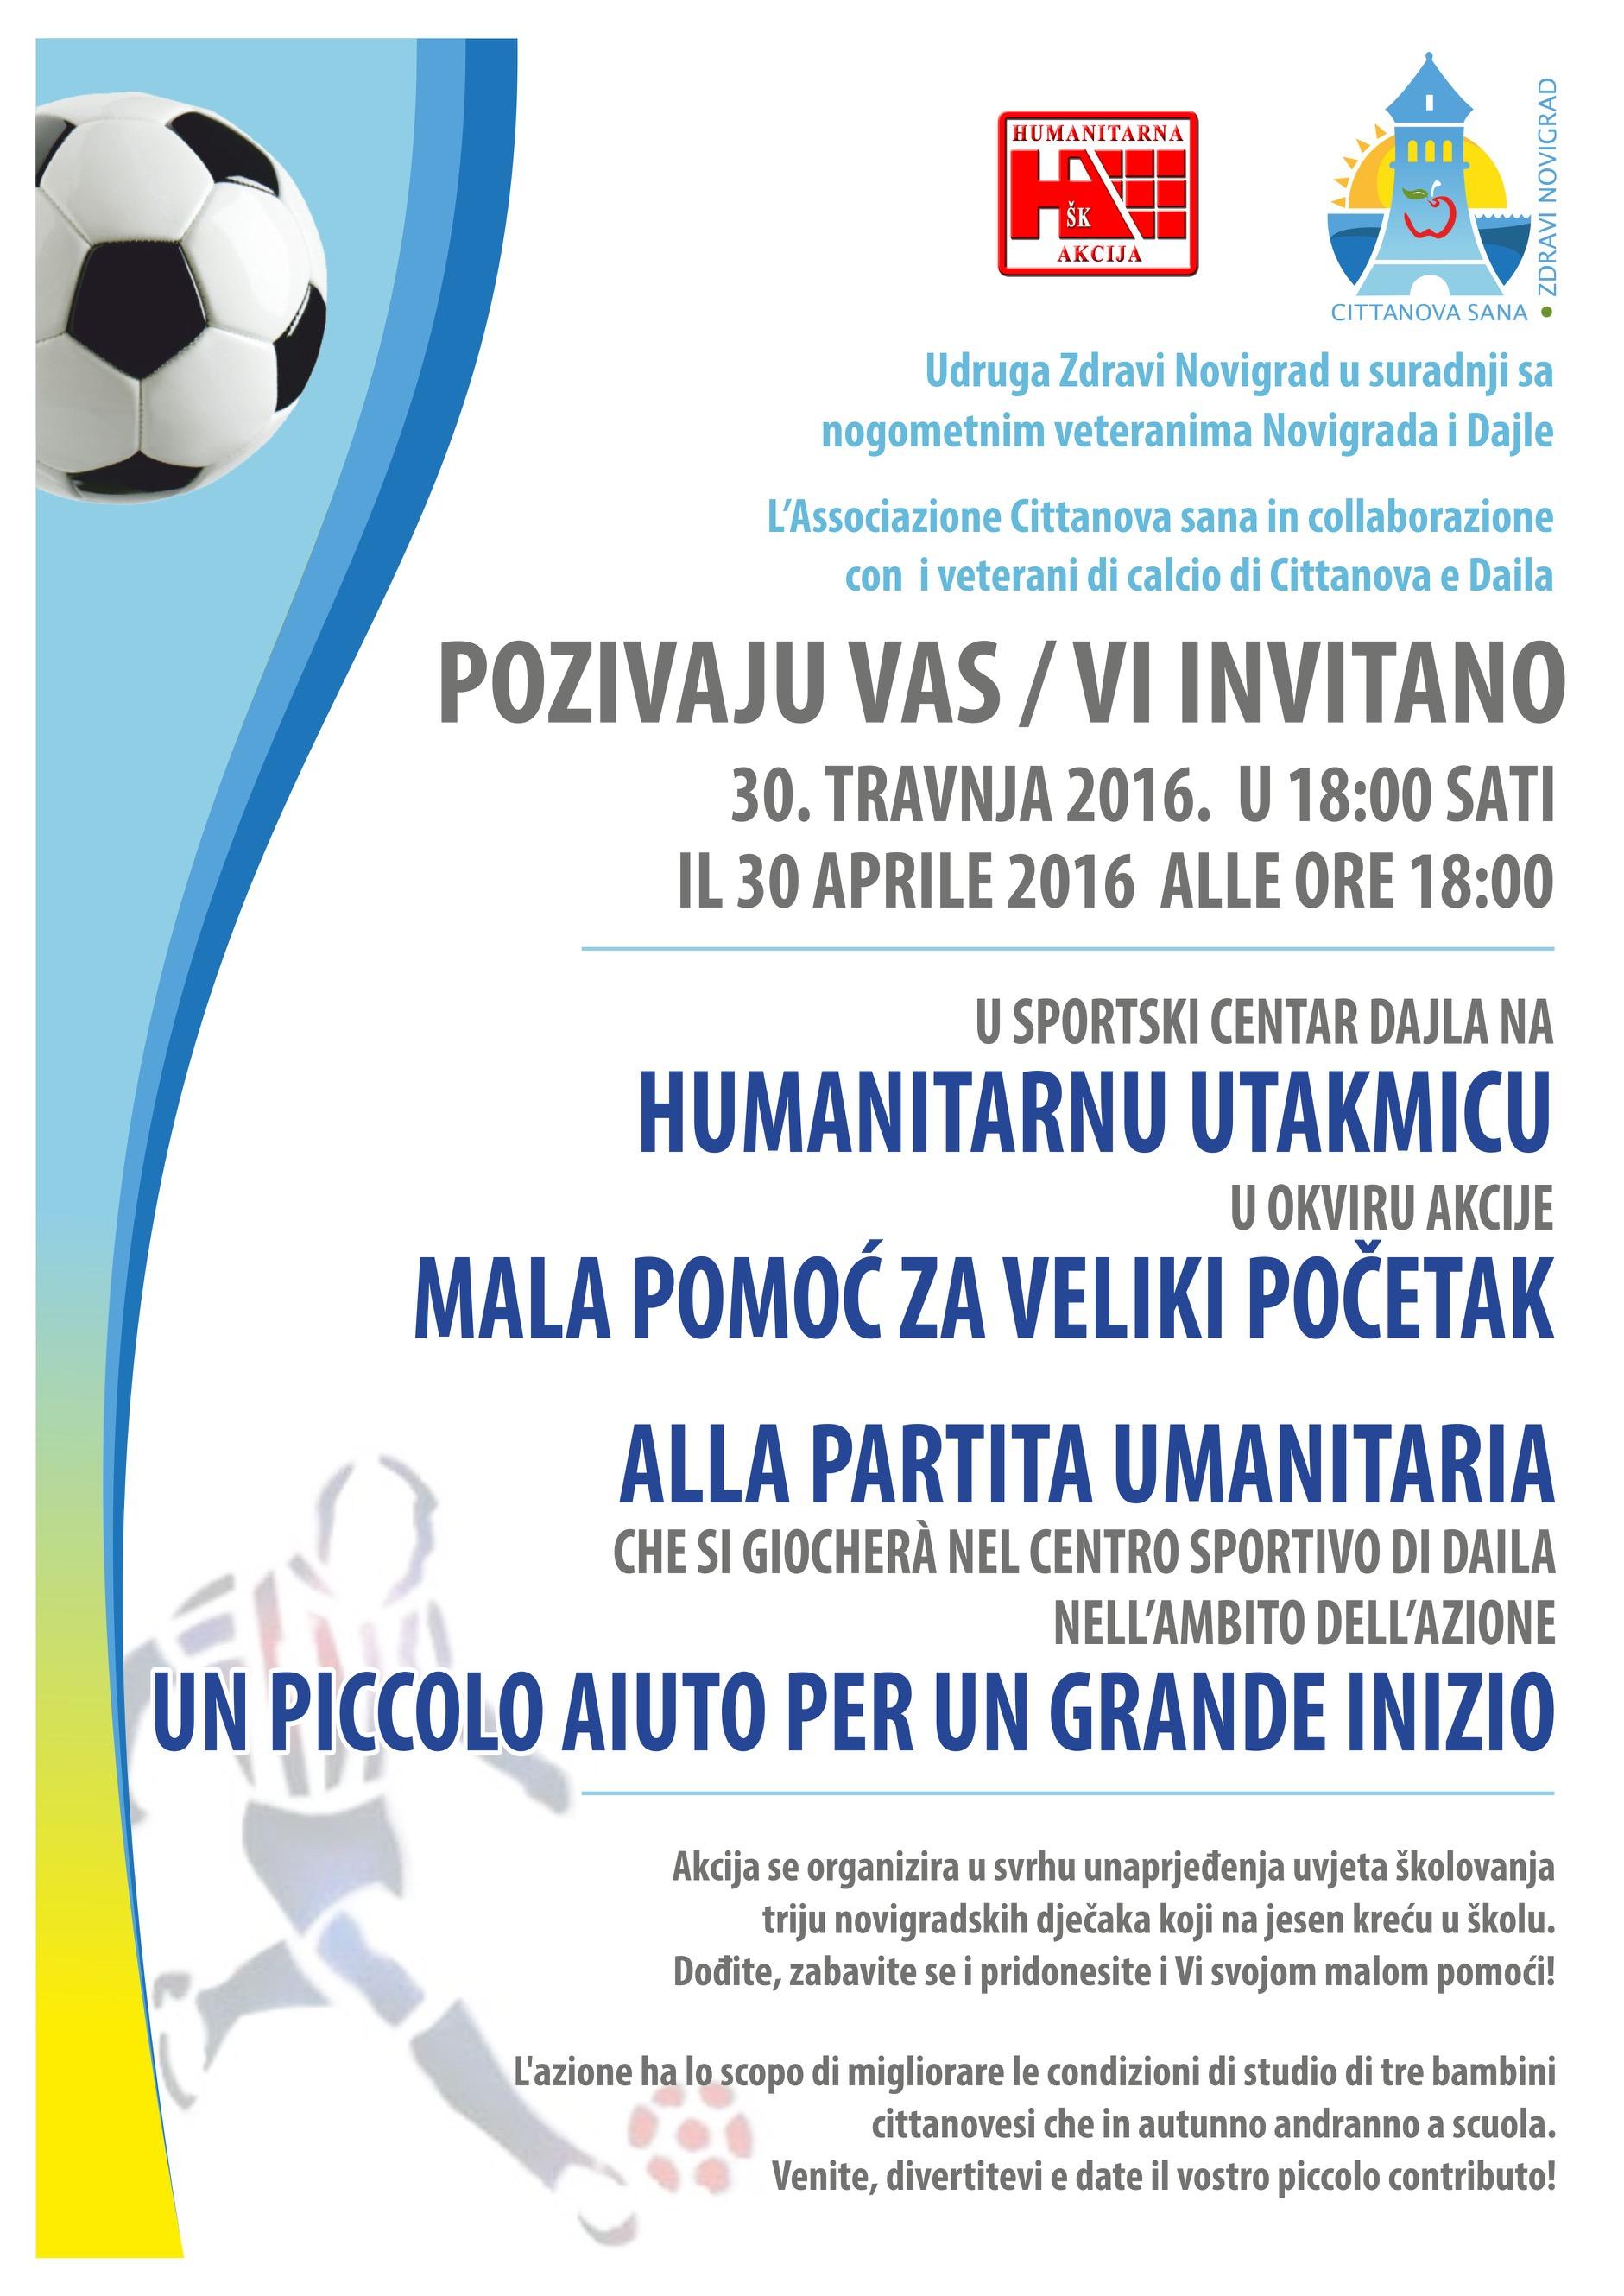 http://www.novigrad.hr/humanitarna_nogometna_utakmica_u_okviru_akcije_mala_pomo_za_veliki_pochetak